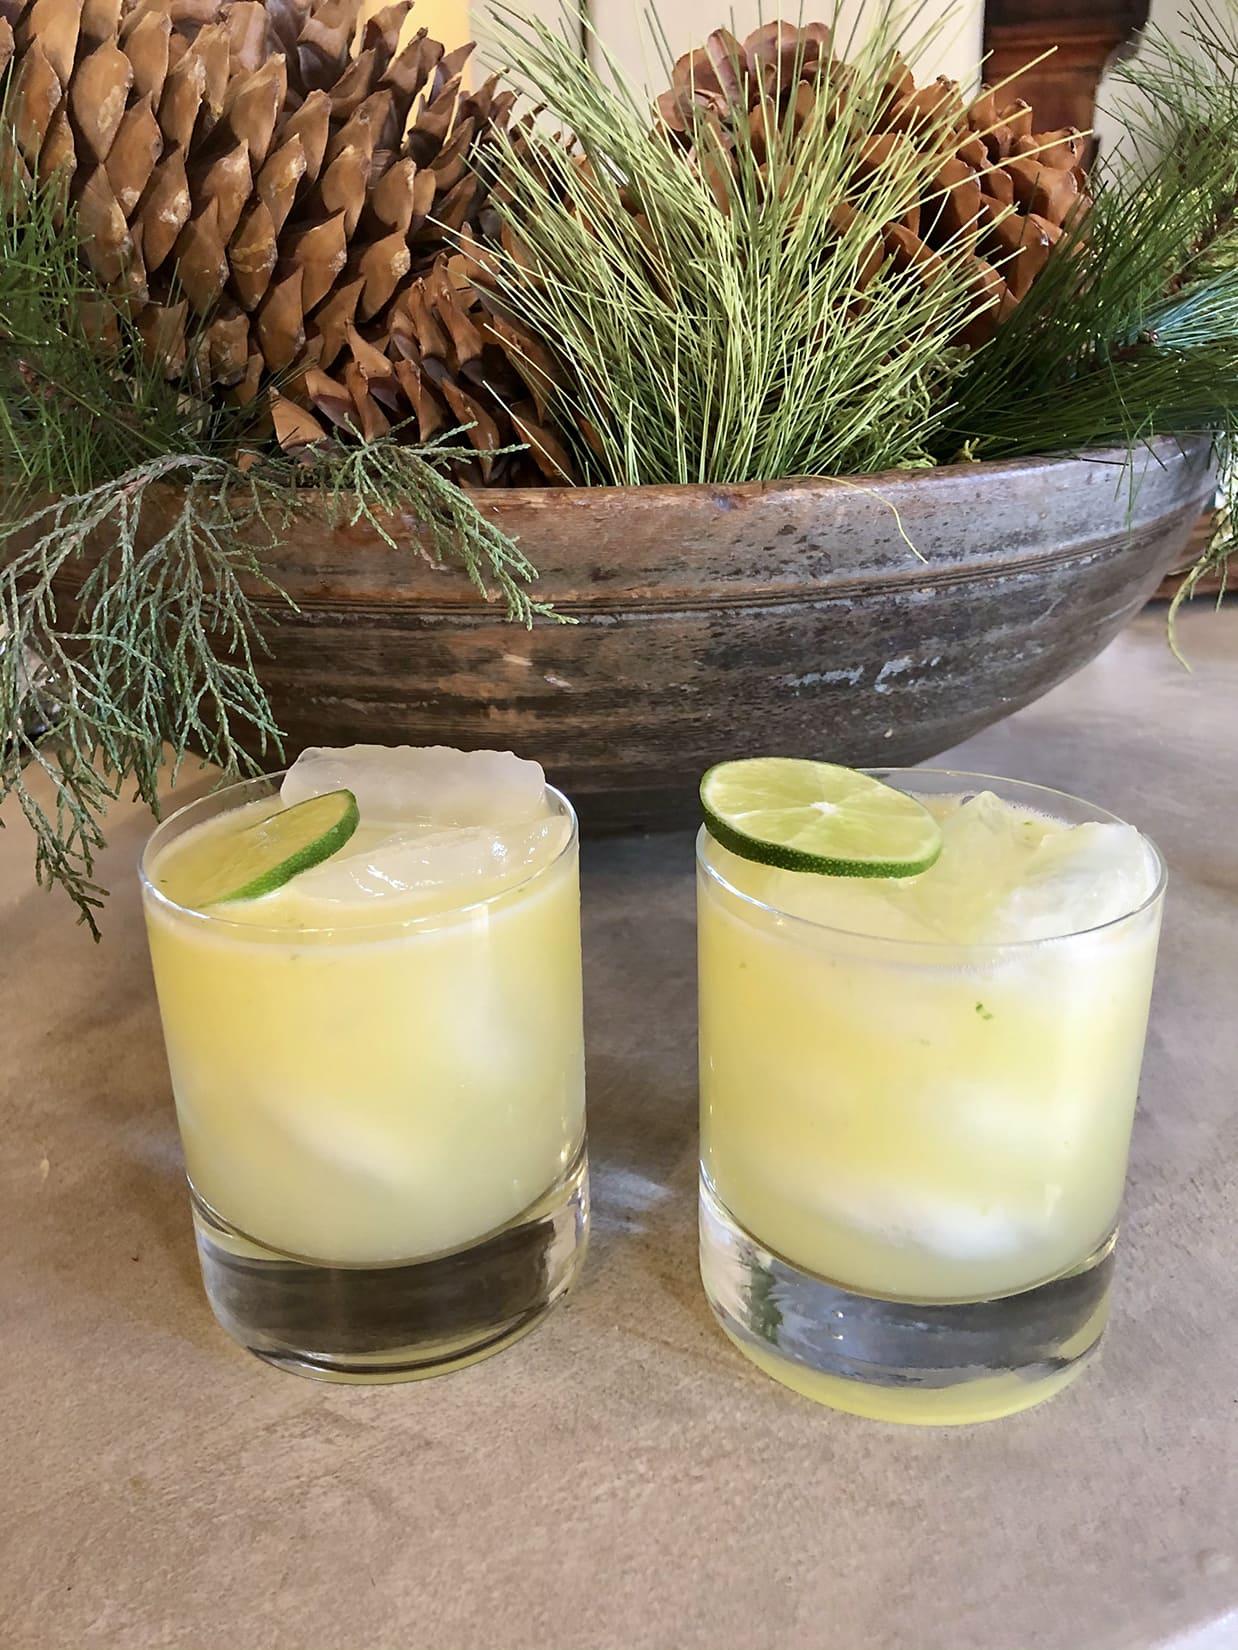 bobby flay's ginger beer margarita on Cindy Hattersley's blog